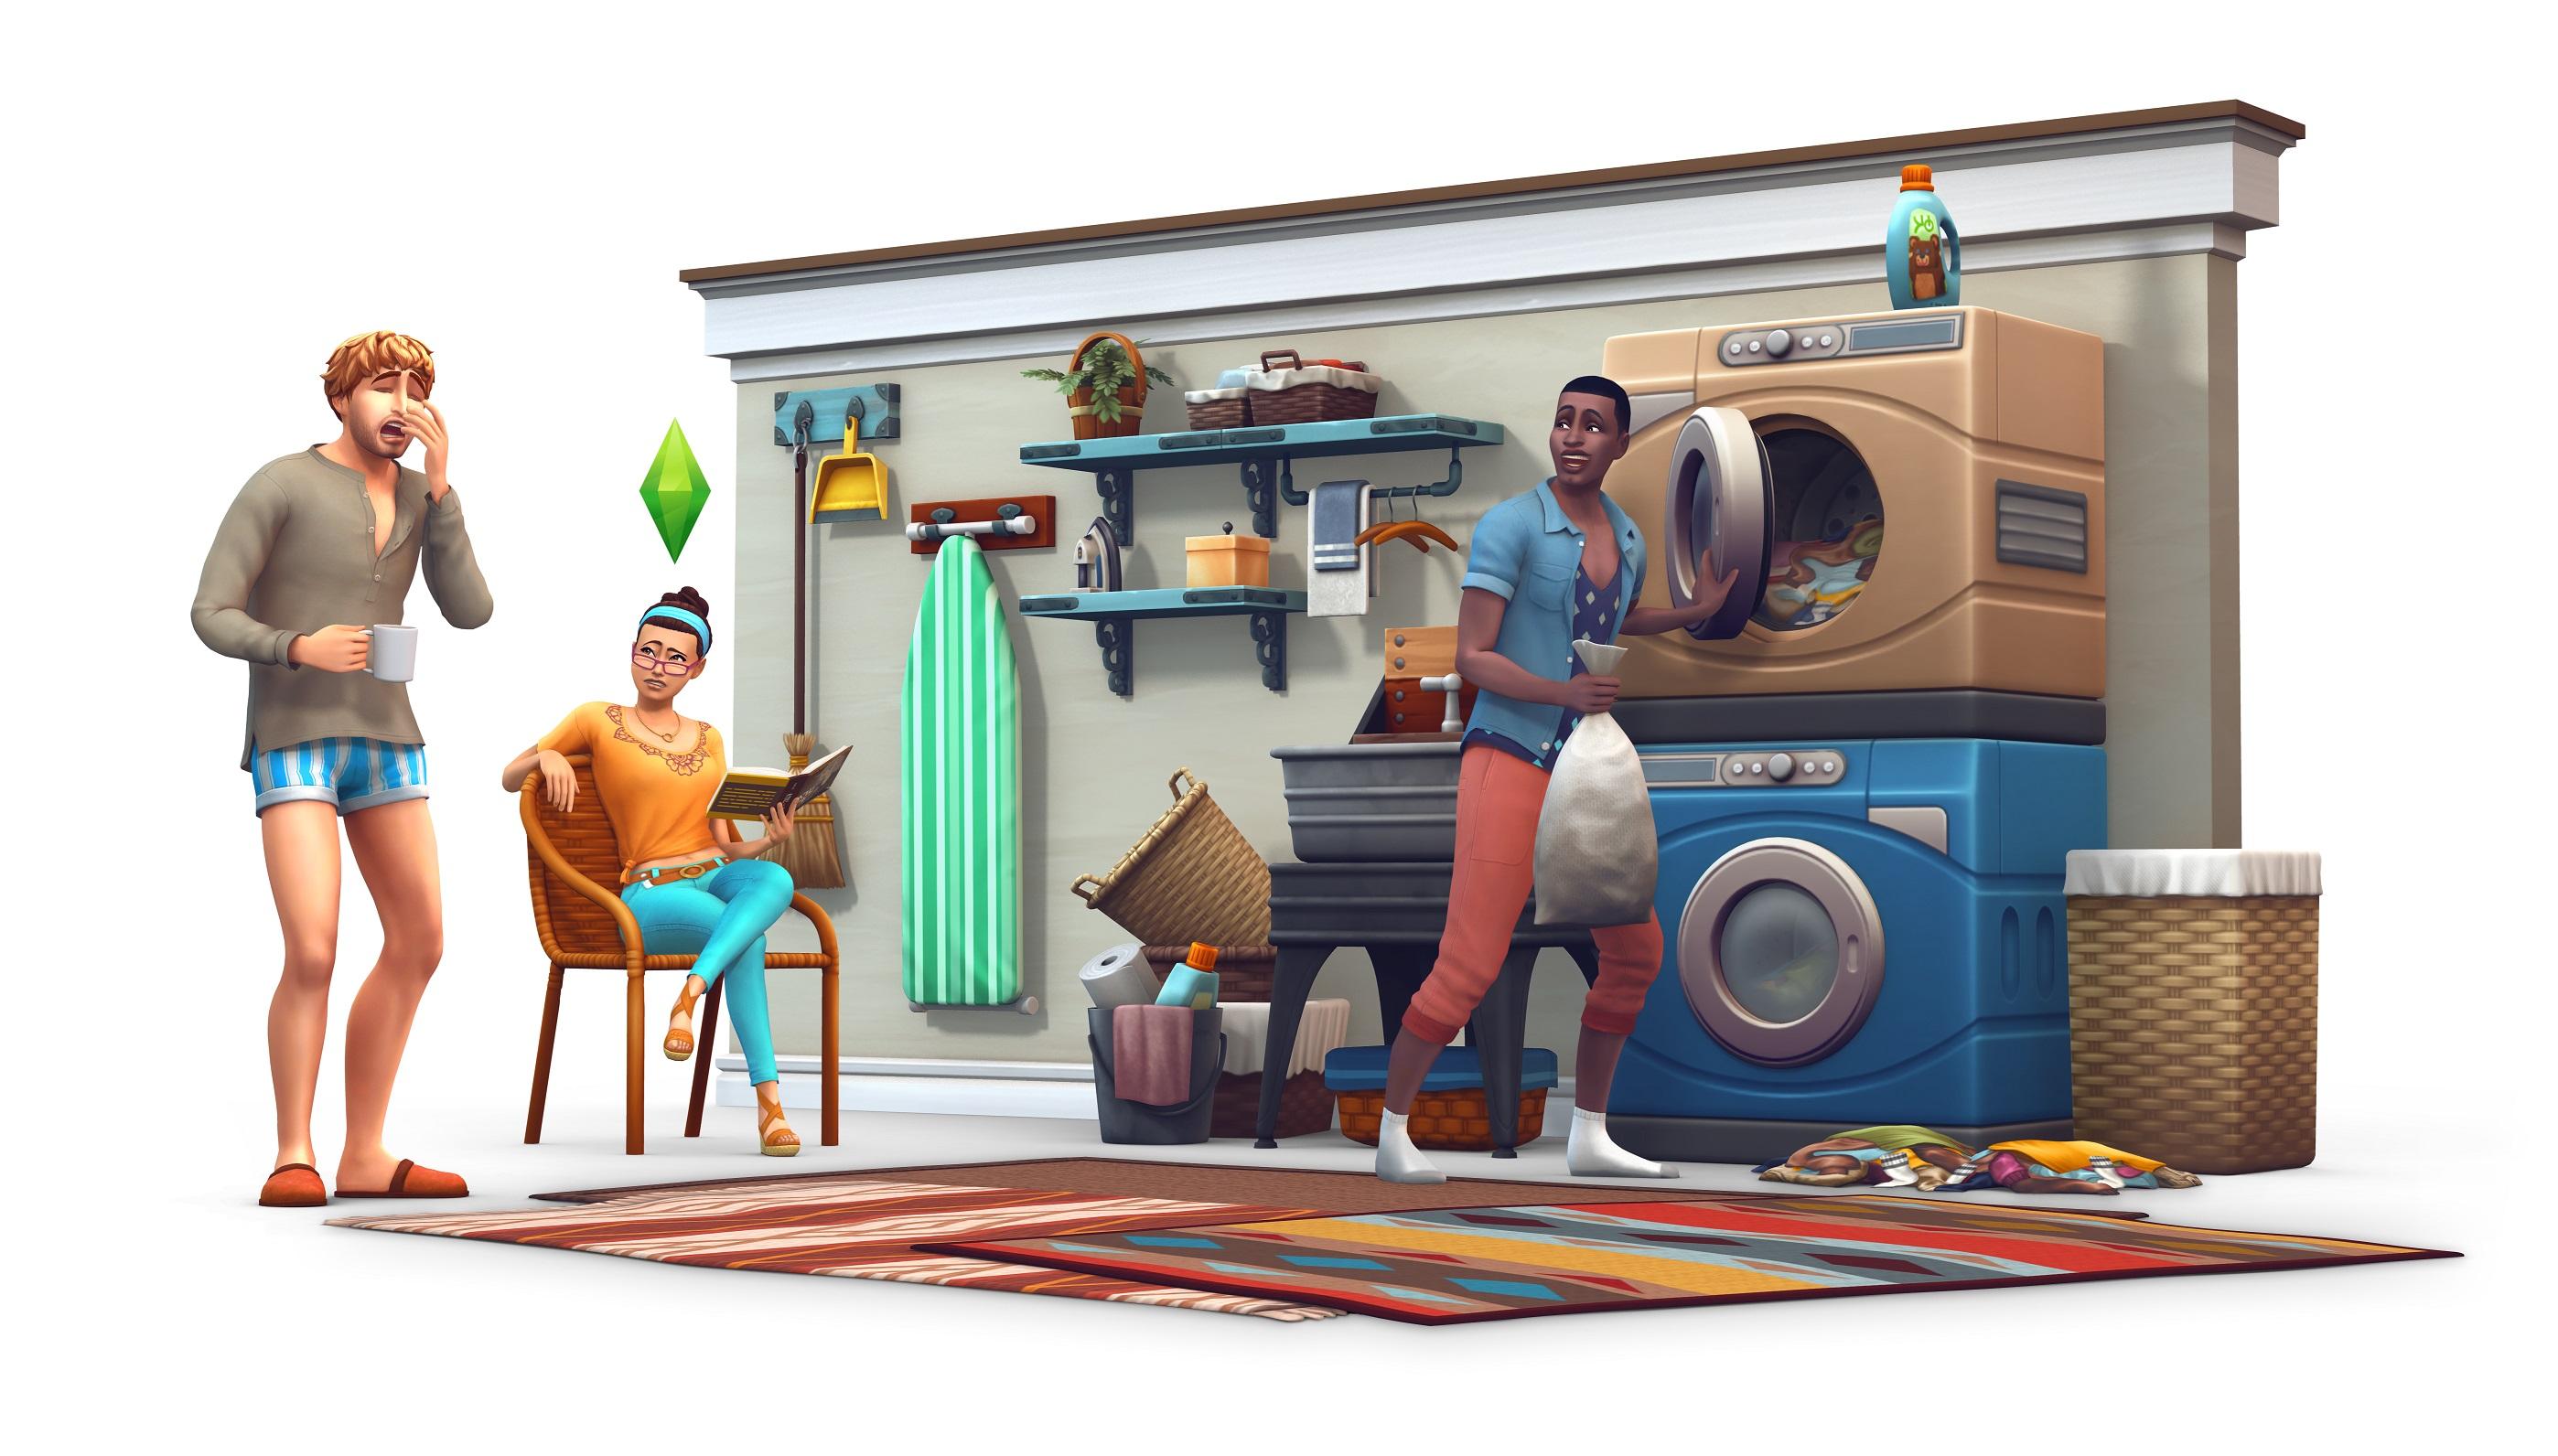 Die-Sims-4-Waschtag-Accessoires-Art-01